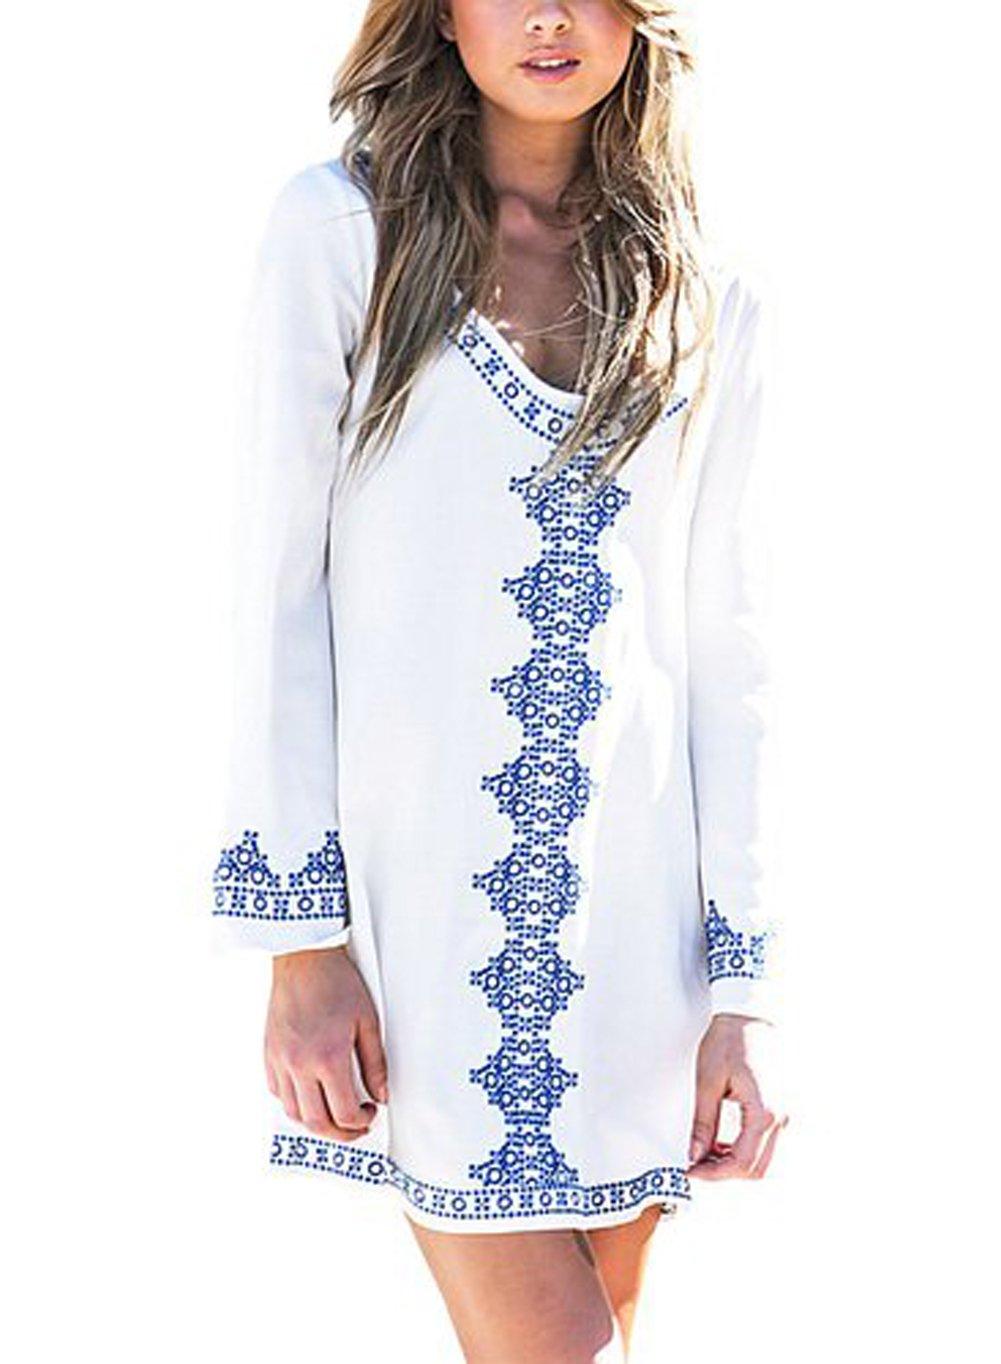 Tueenhuge Women 's Long Sleeve Beachwear Swimsuit Cover up Tunic Shirts White One Size